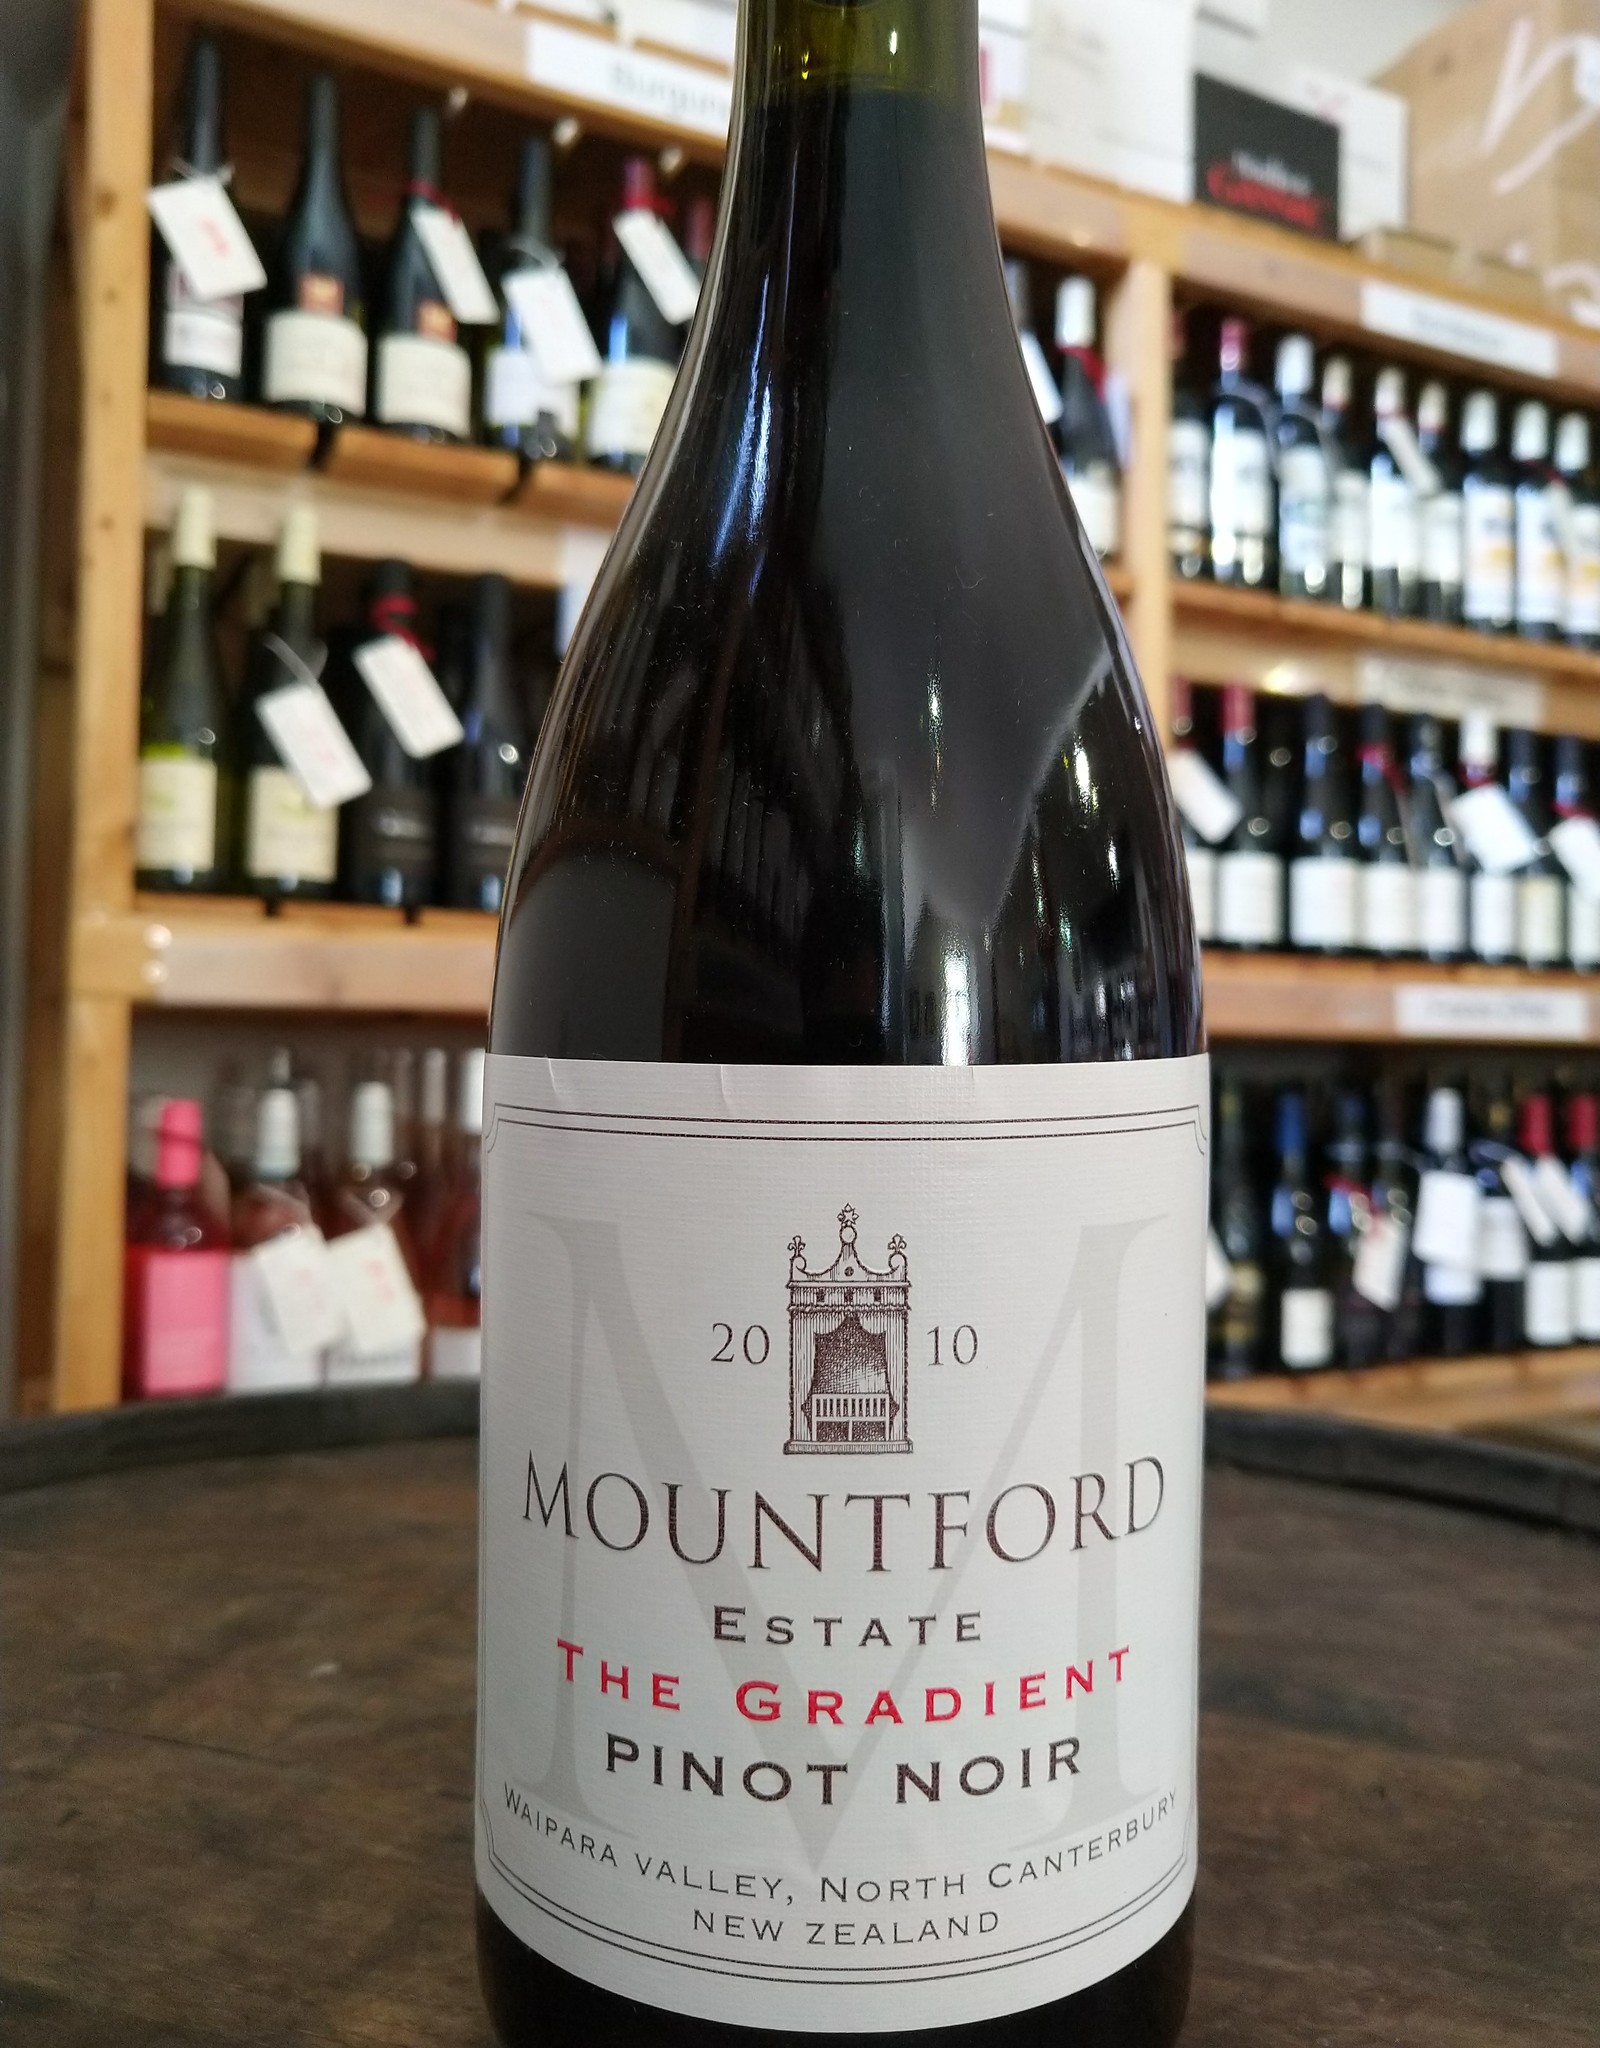 Gradient Pinot Noir 2010, Mountford Estate